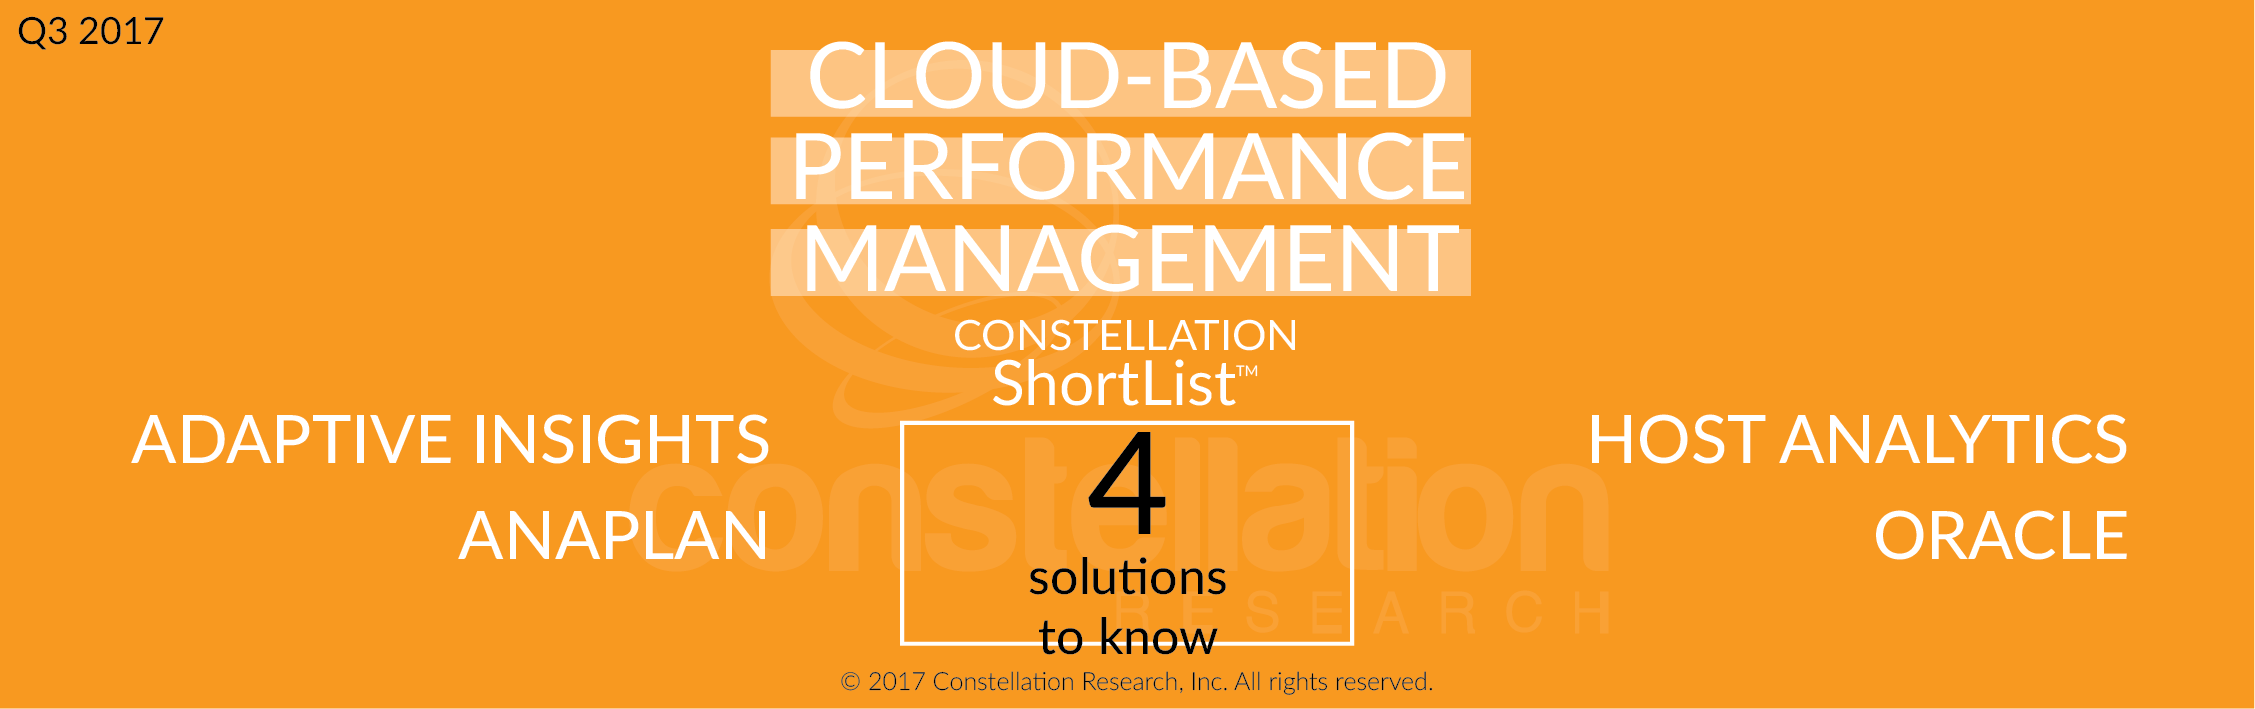 Constellation ShortList Cloud-Based Performance Management